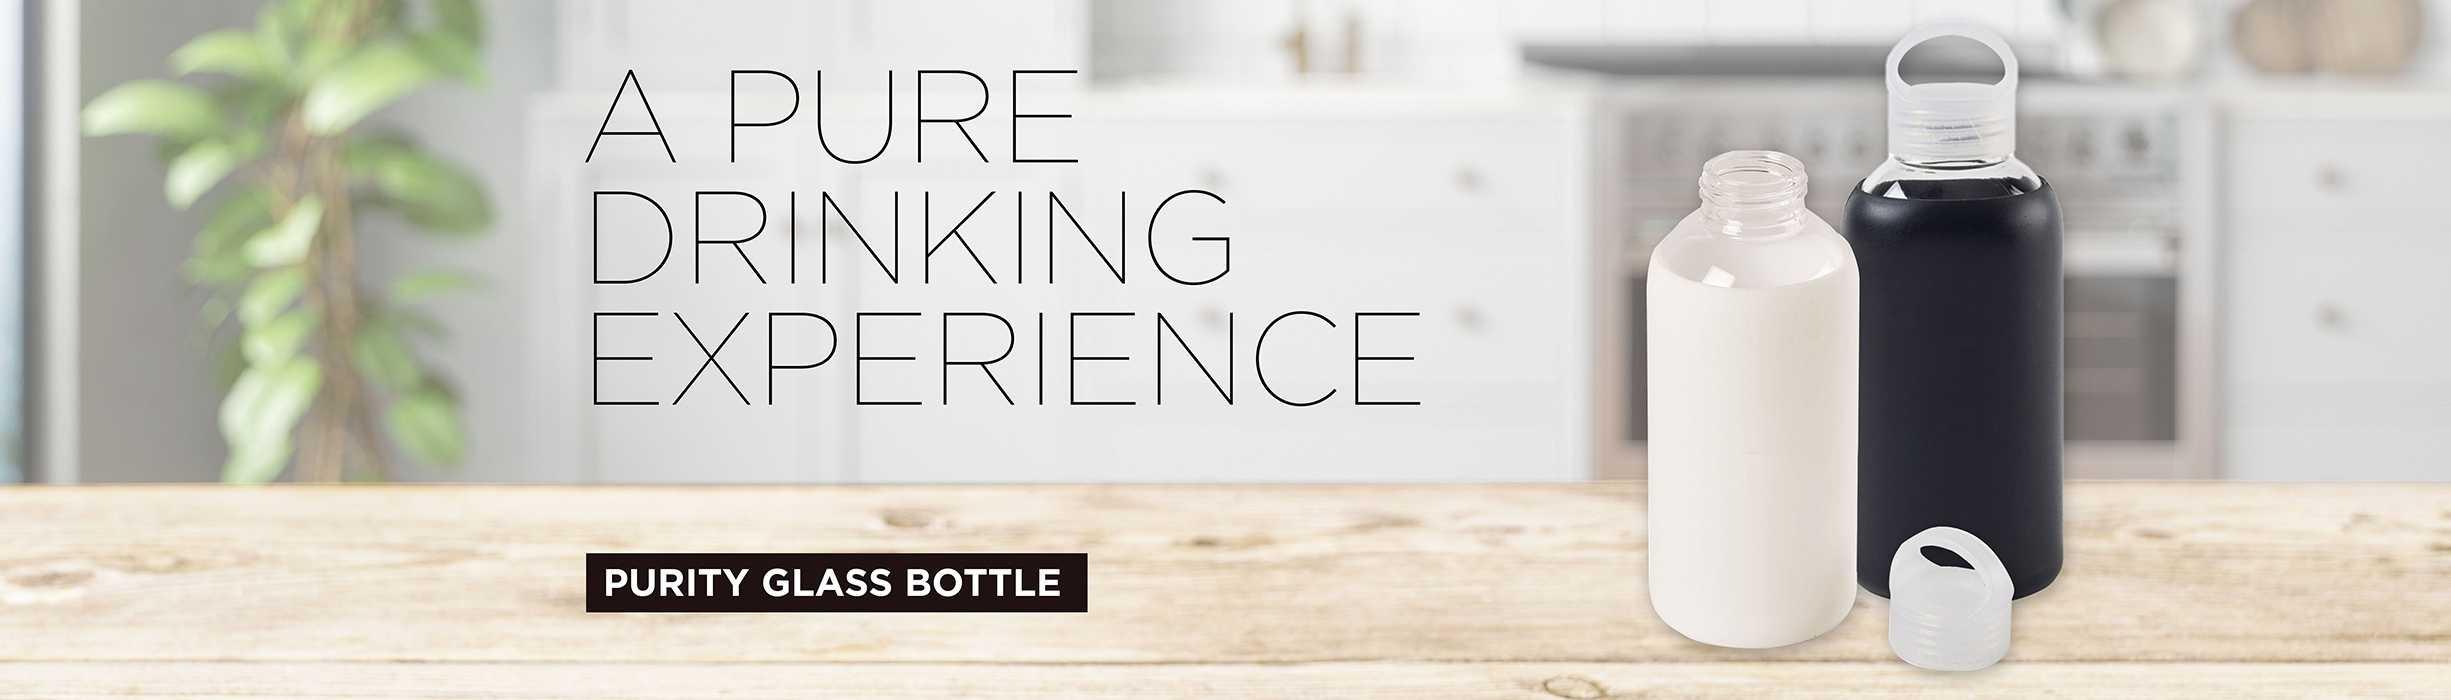 Purity Glass Bottle AIM